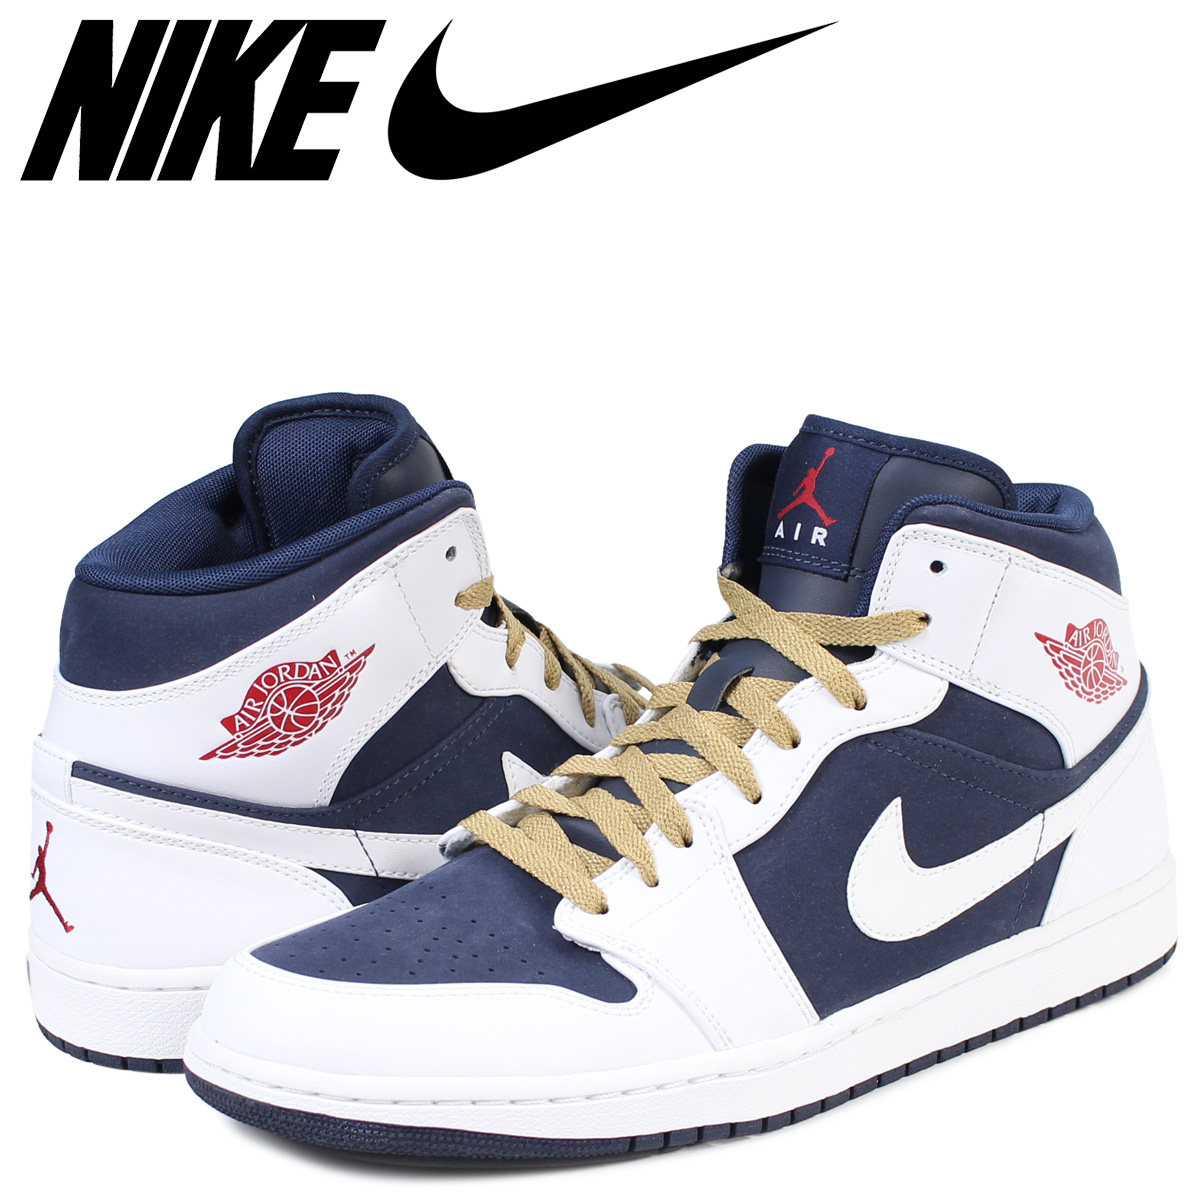 9e01c496dfa Whats up Sports: NIKE AIR JORDAN 1 PHAT Nike Air Jordan 1 sneakers ...